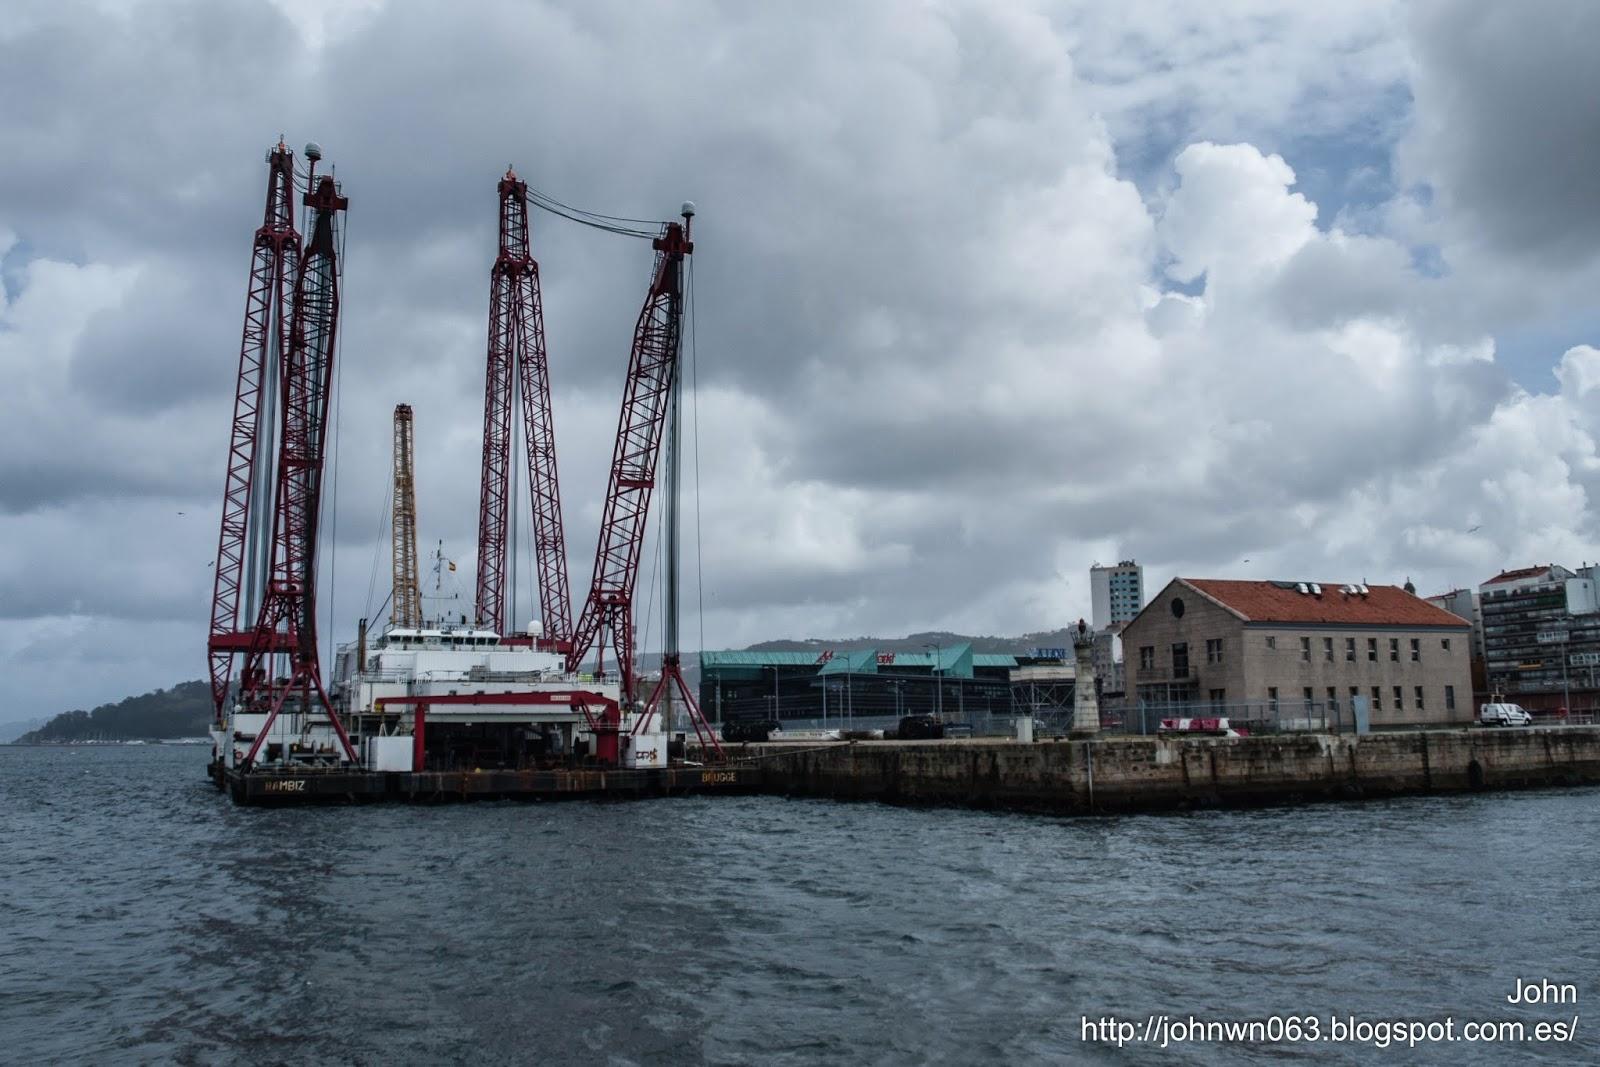 rambiz, grua flotante, crane, fotos de barcos, imagenes de barcos, tecnologia